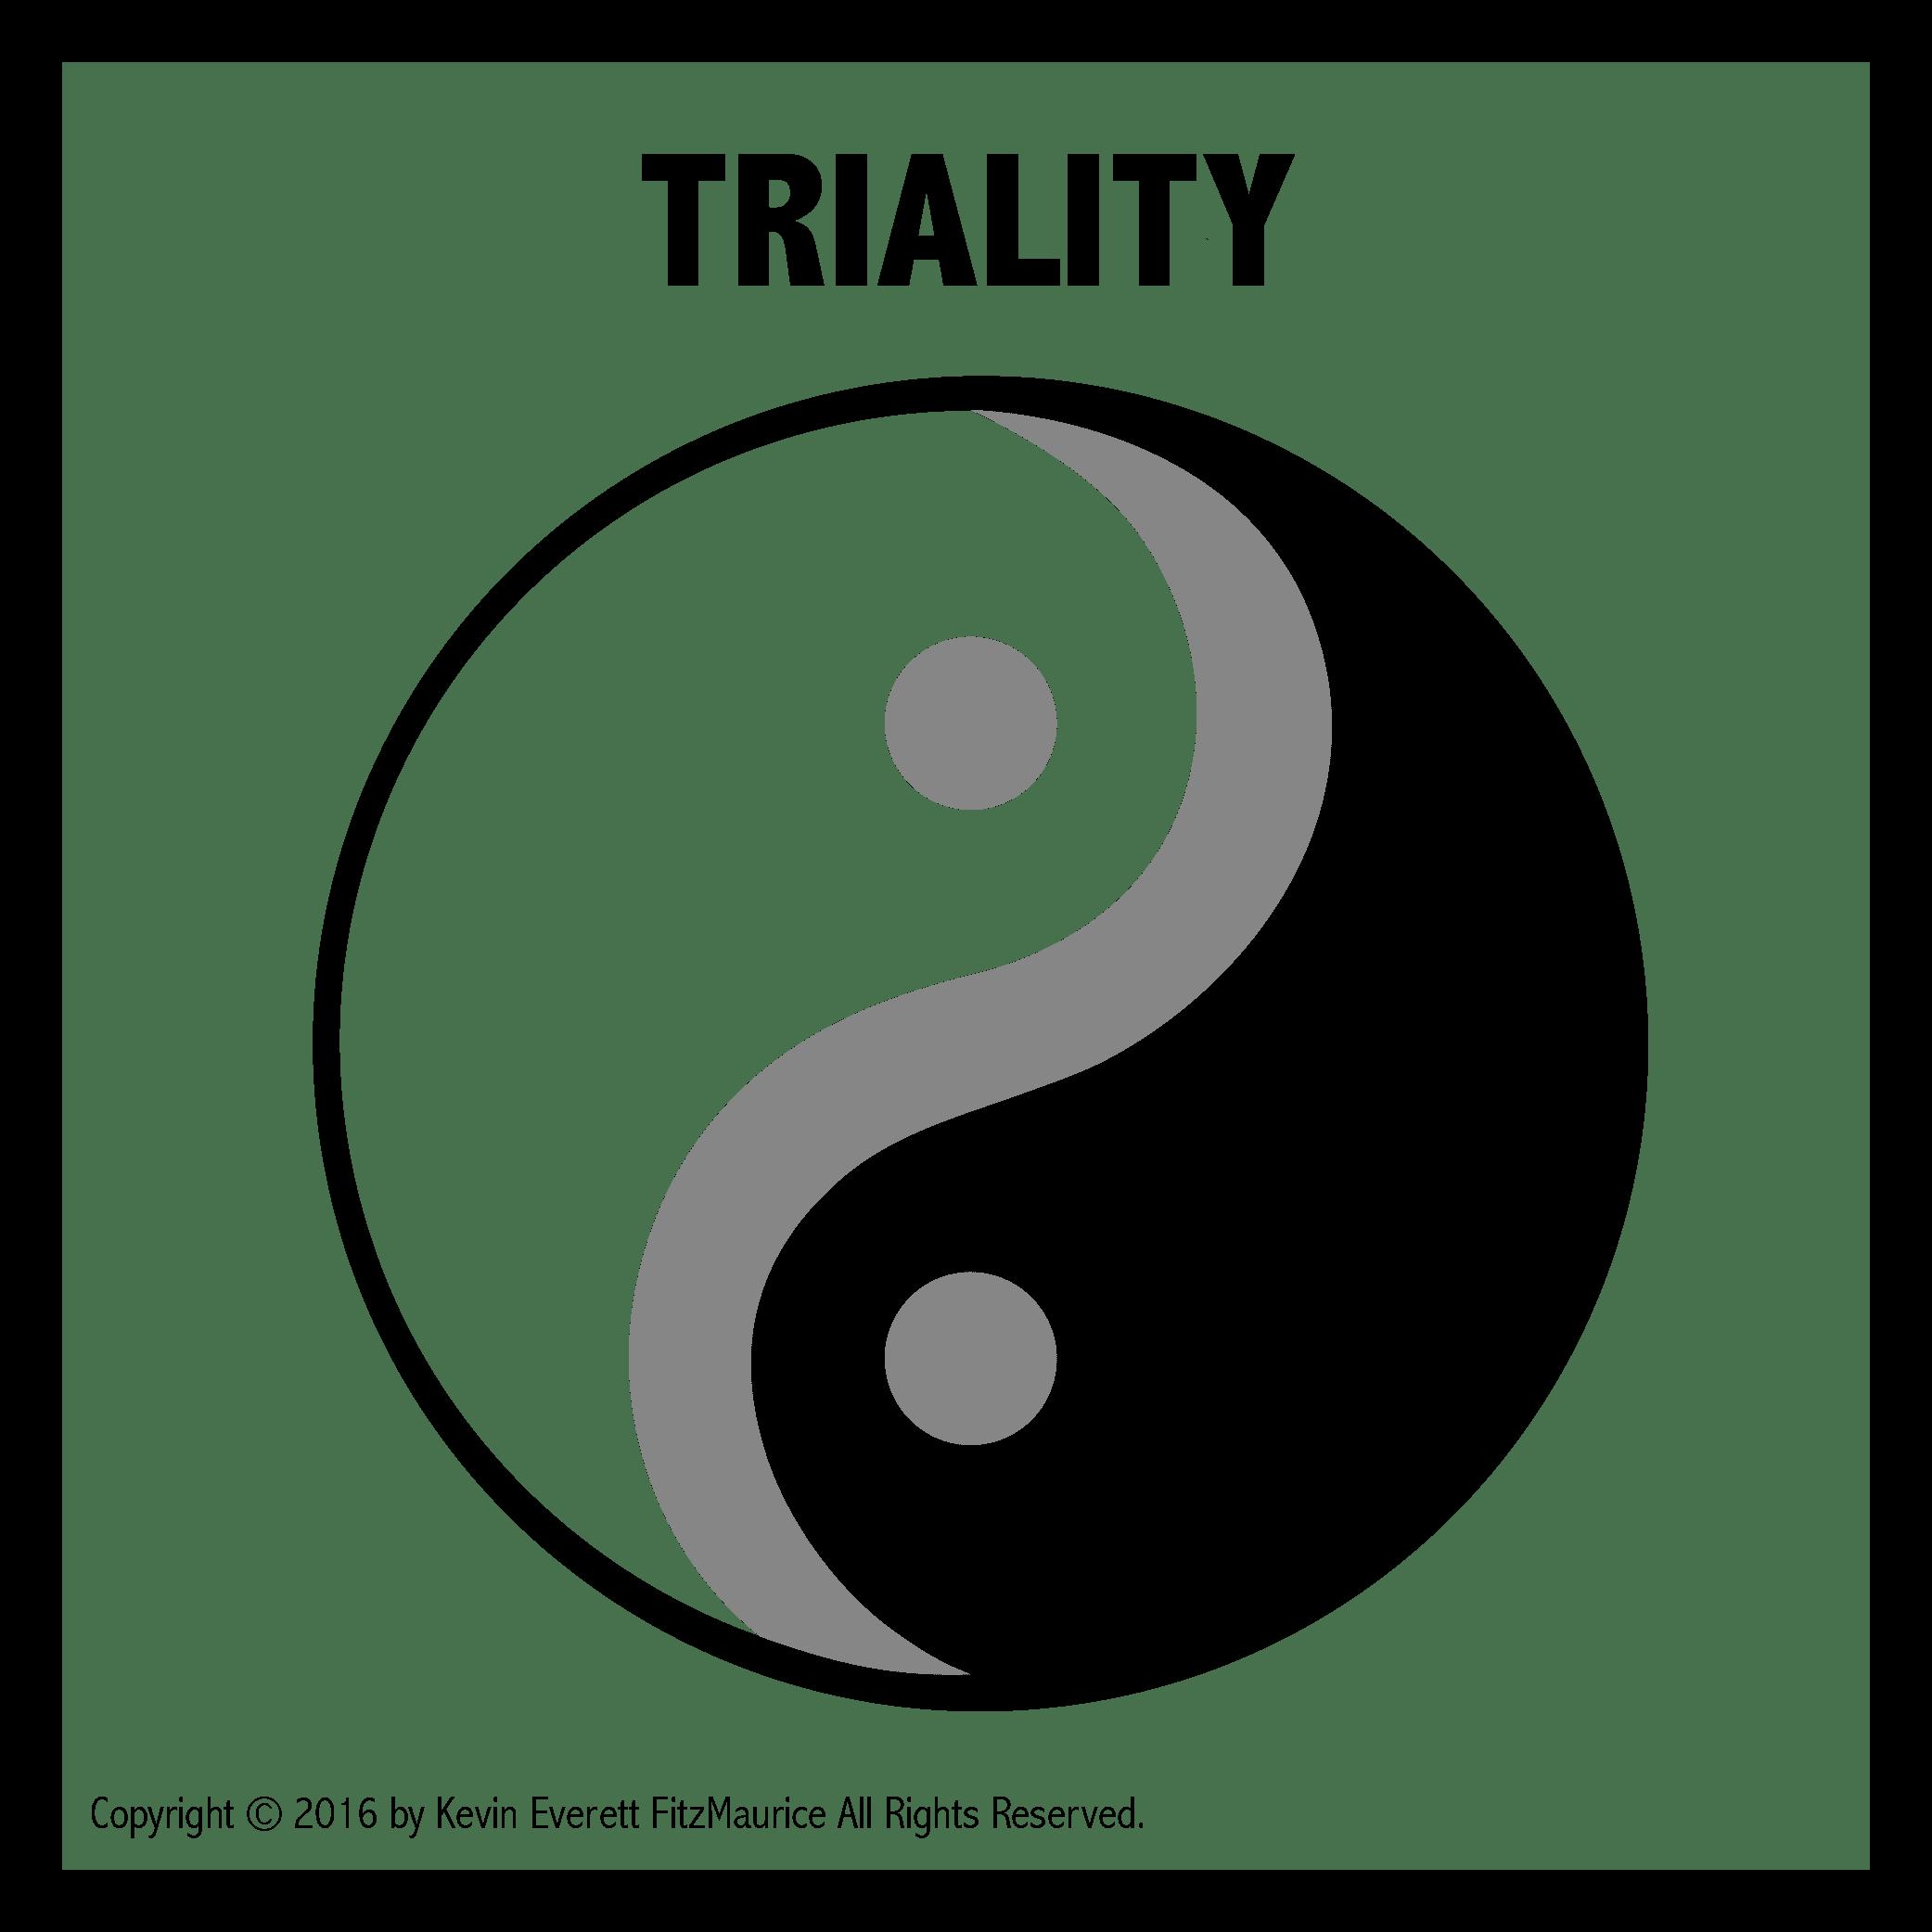 diagram of triality